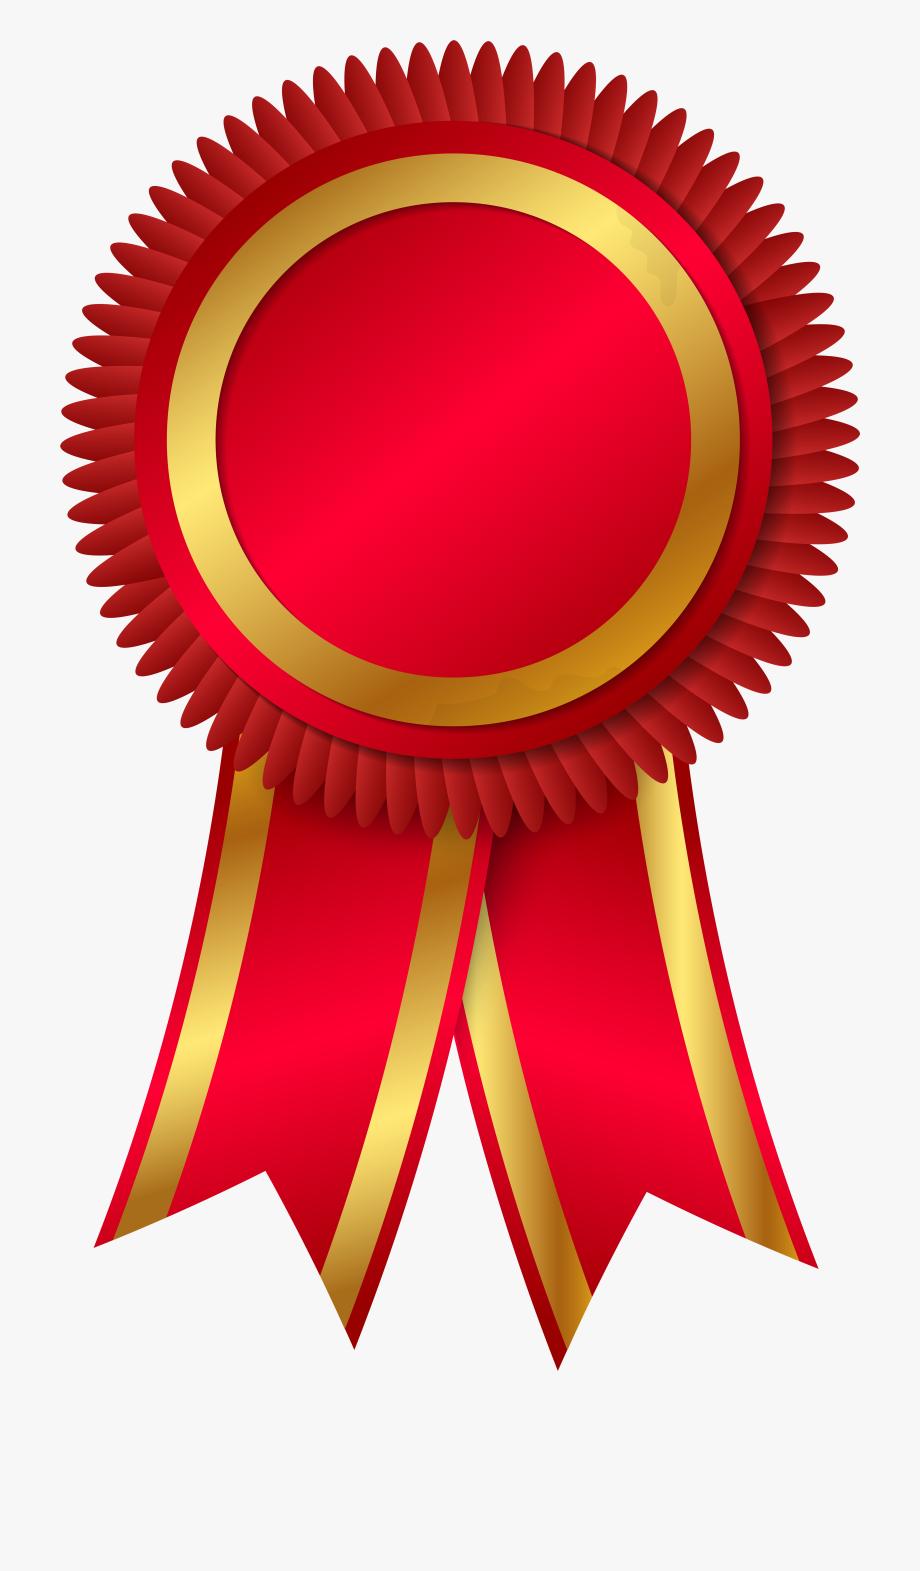 Physical item logo, a ribbon